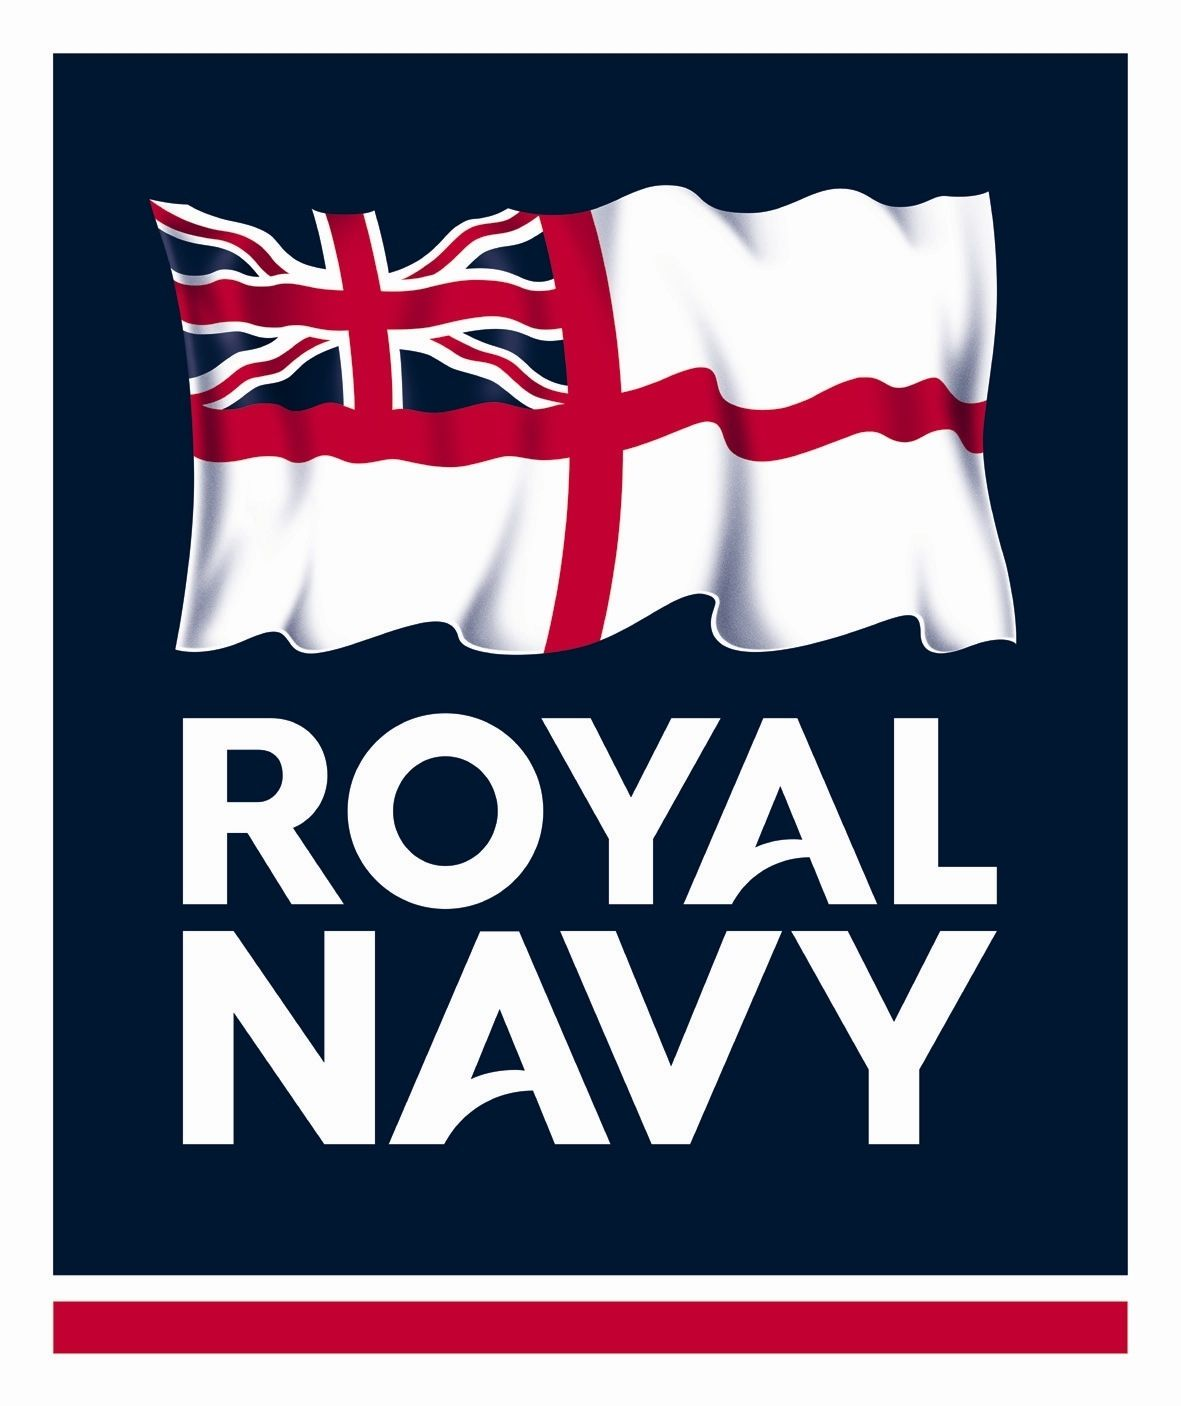 Royal Navy Royal Navy Reserve Royal Navy Navy Logo